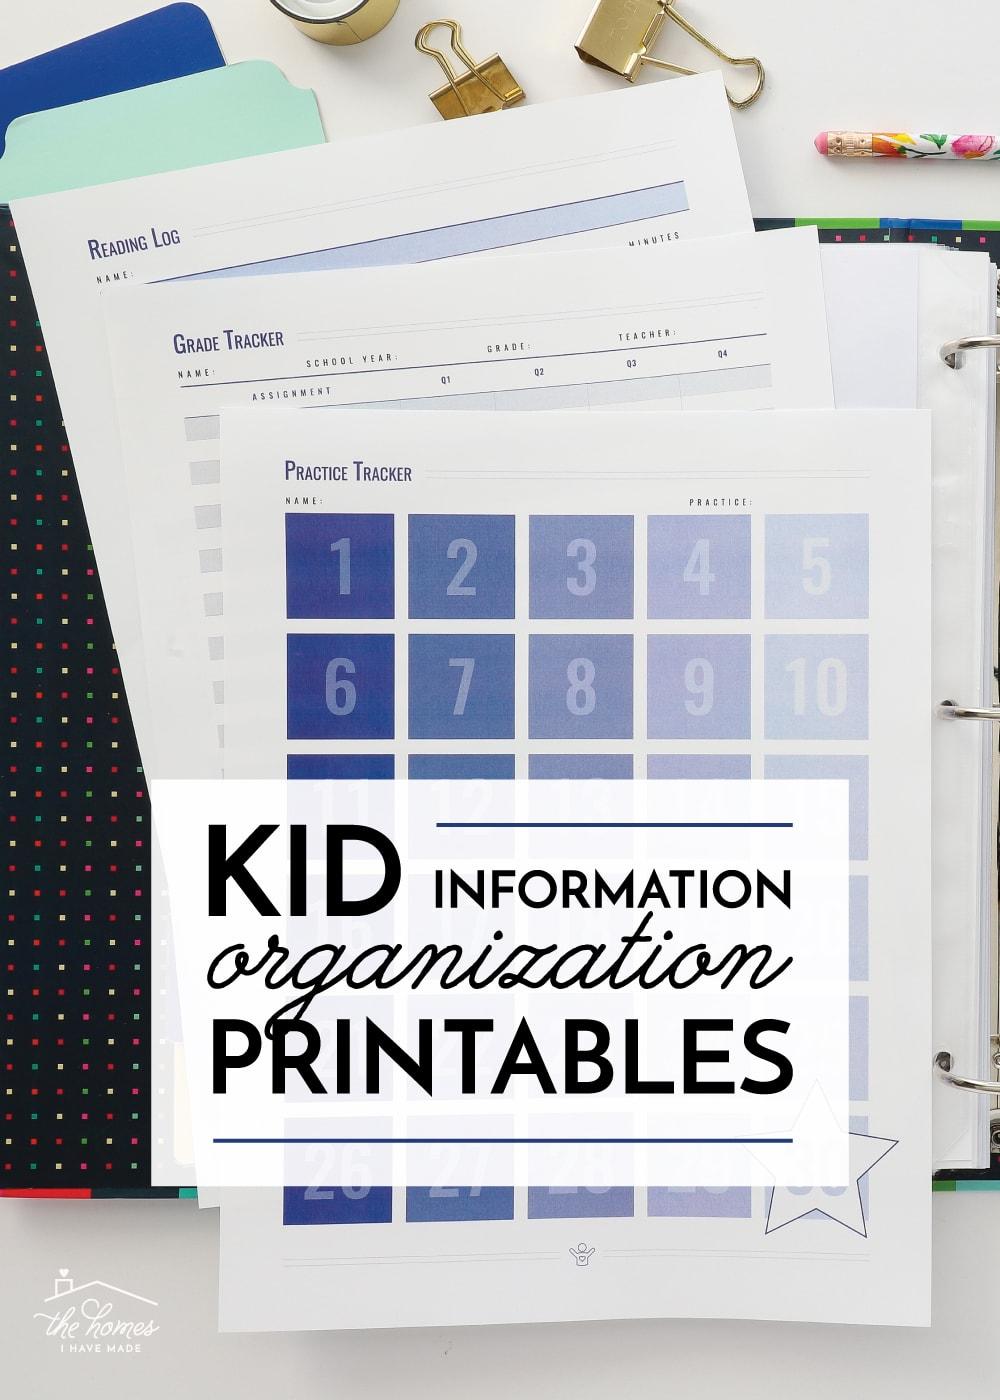 Kid Organization Printables